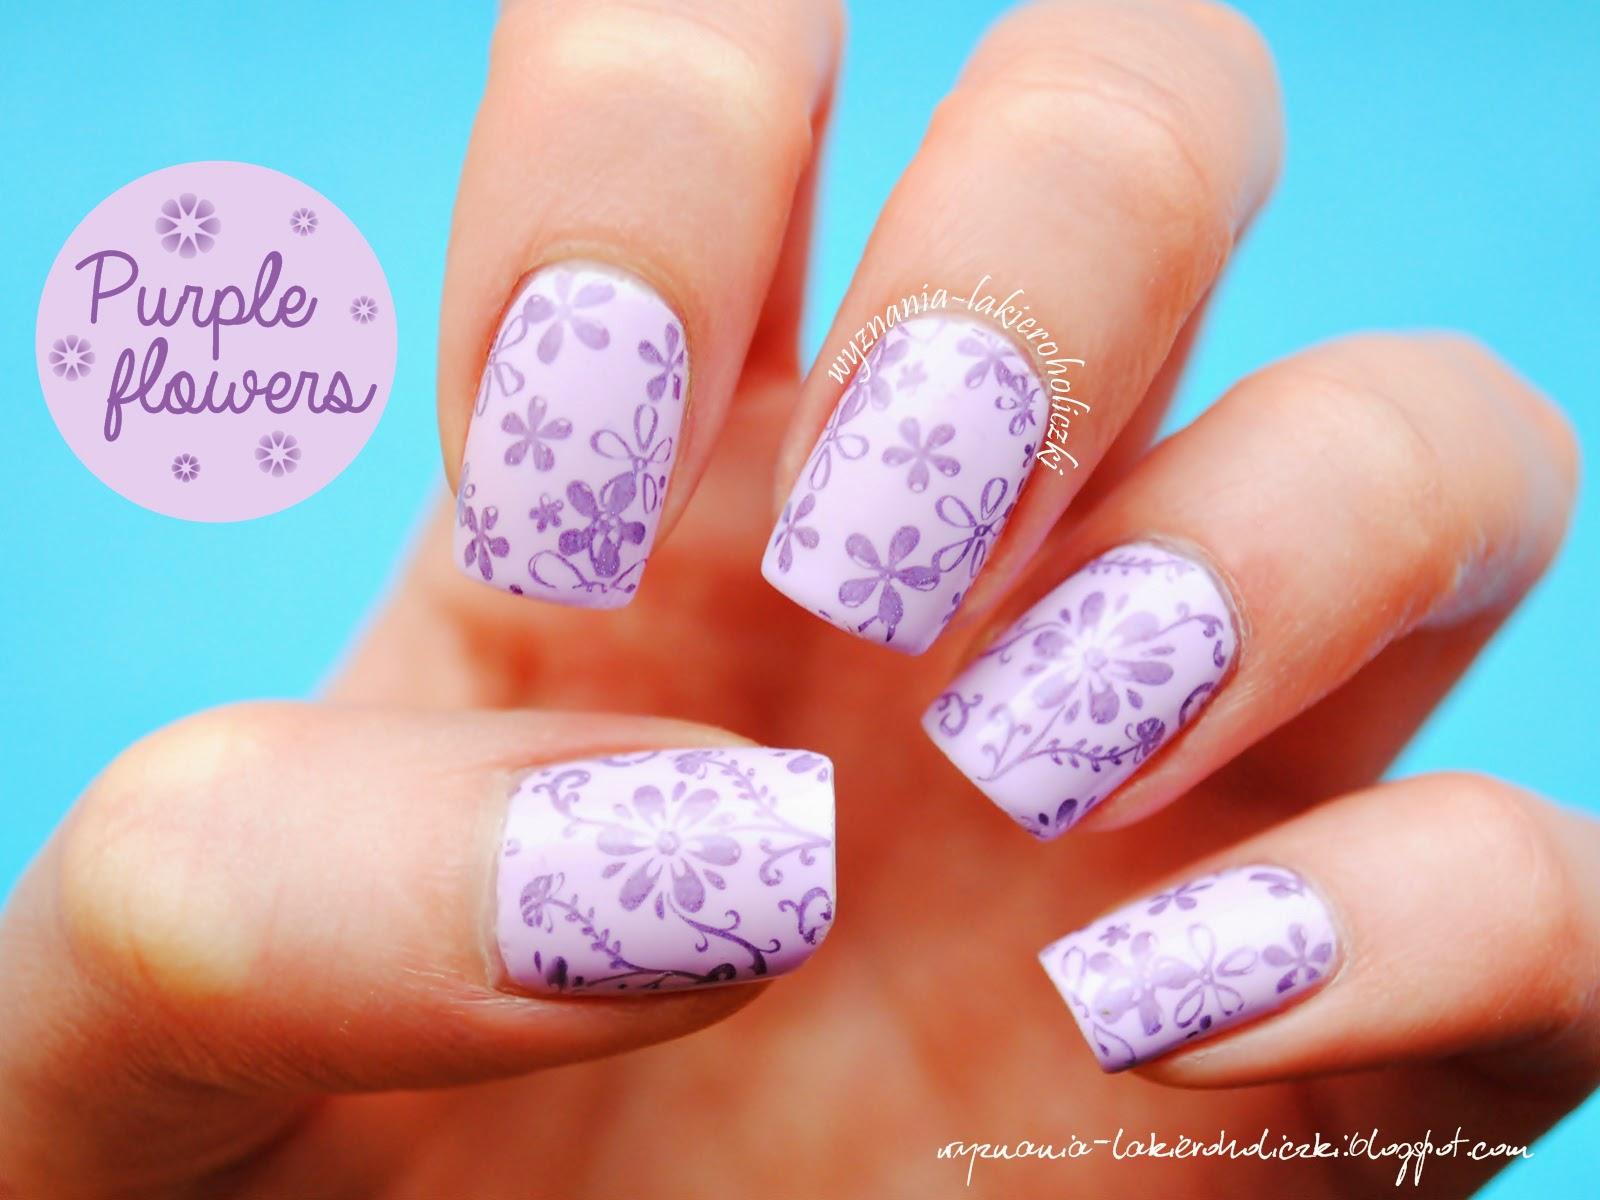 Born Pretty Store Blog: April Nail Art Designs Show !